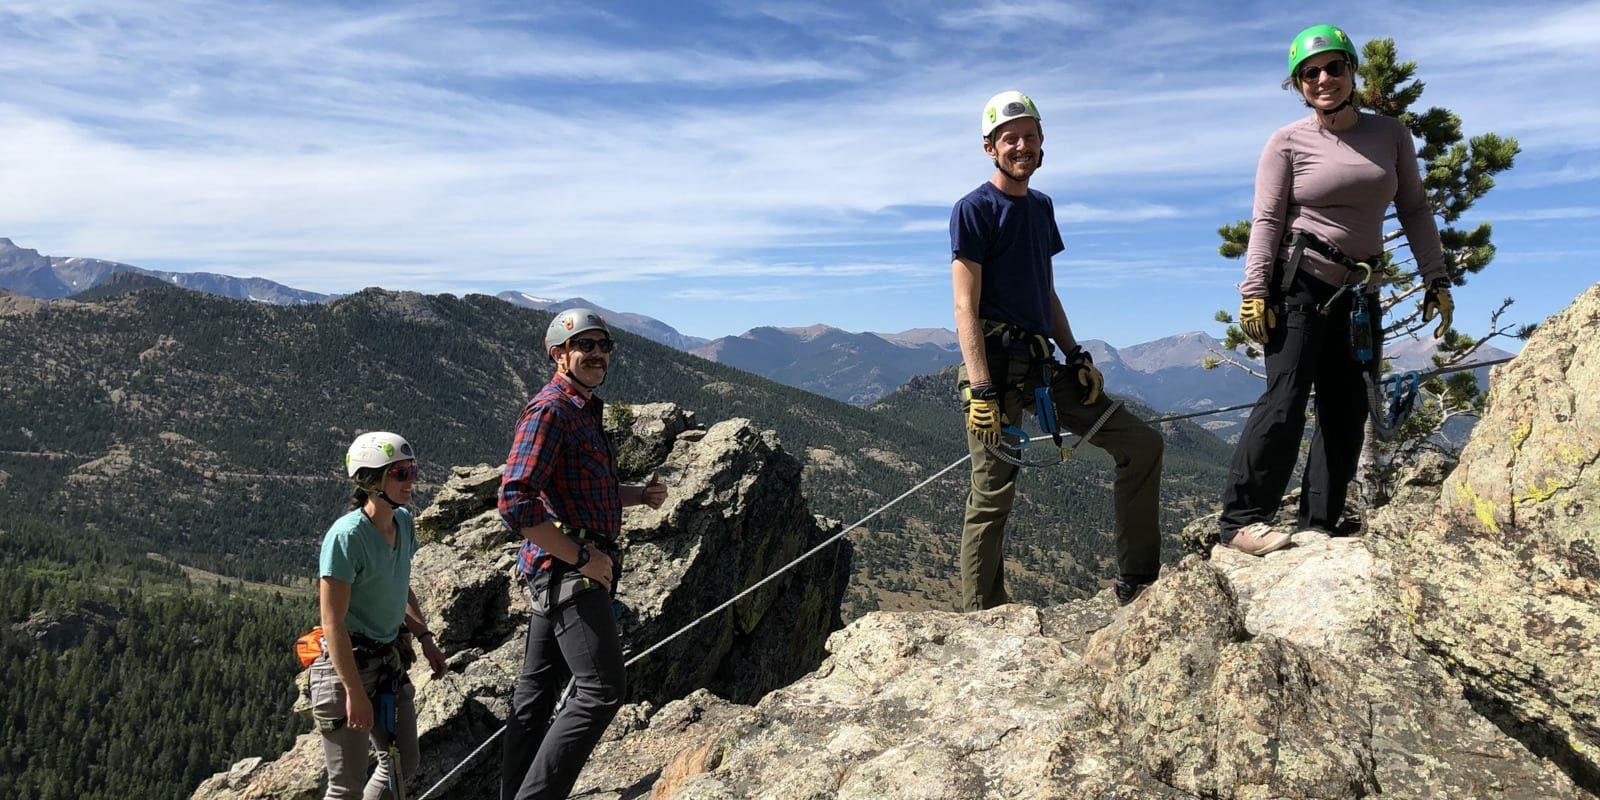 Image of people climbing at Kent Mountain Adventure Center in Estes Park, Colorado